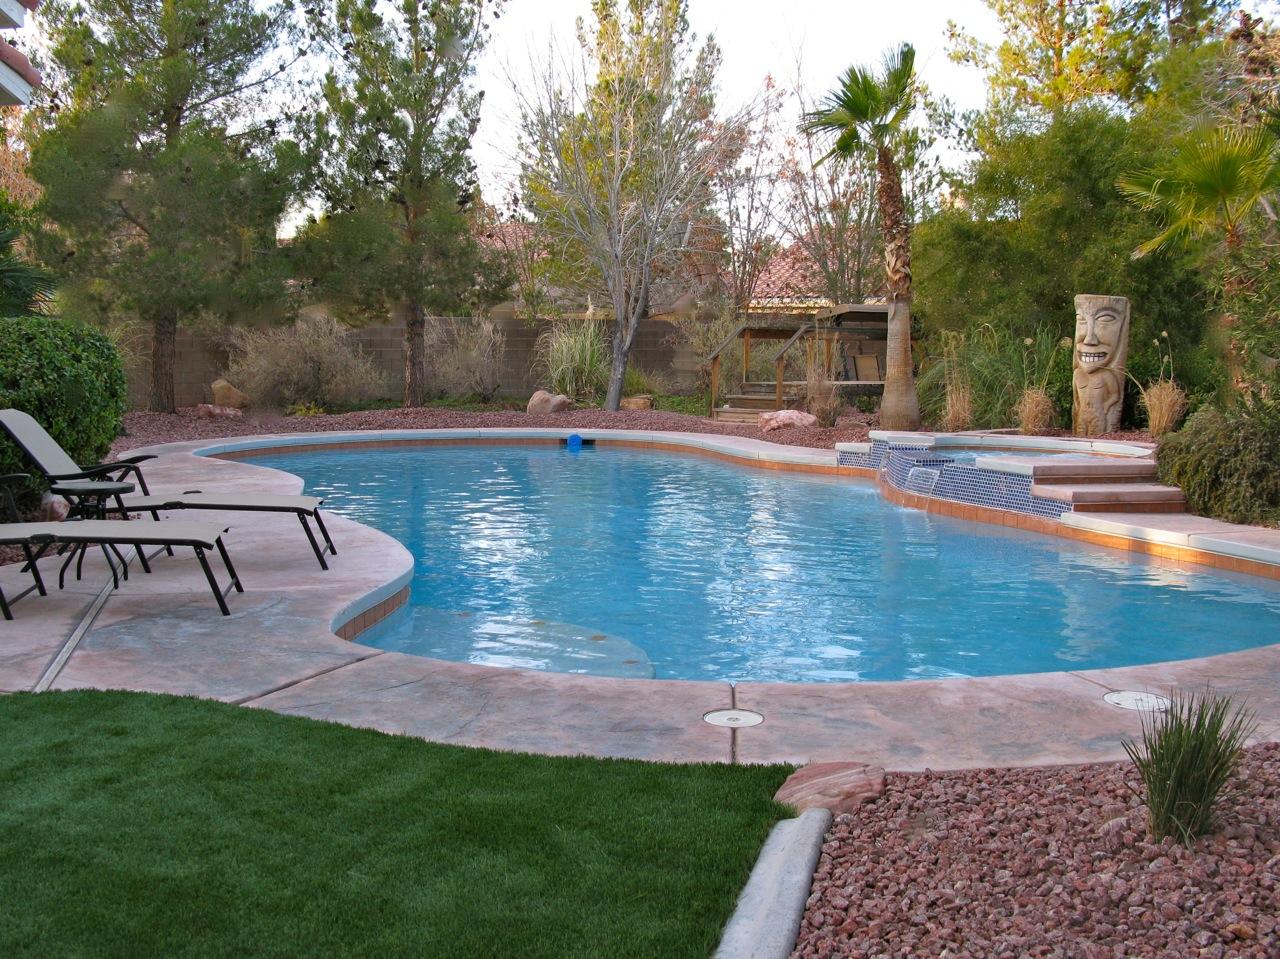 Las Vegas Vacation Home Rental Blog